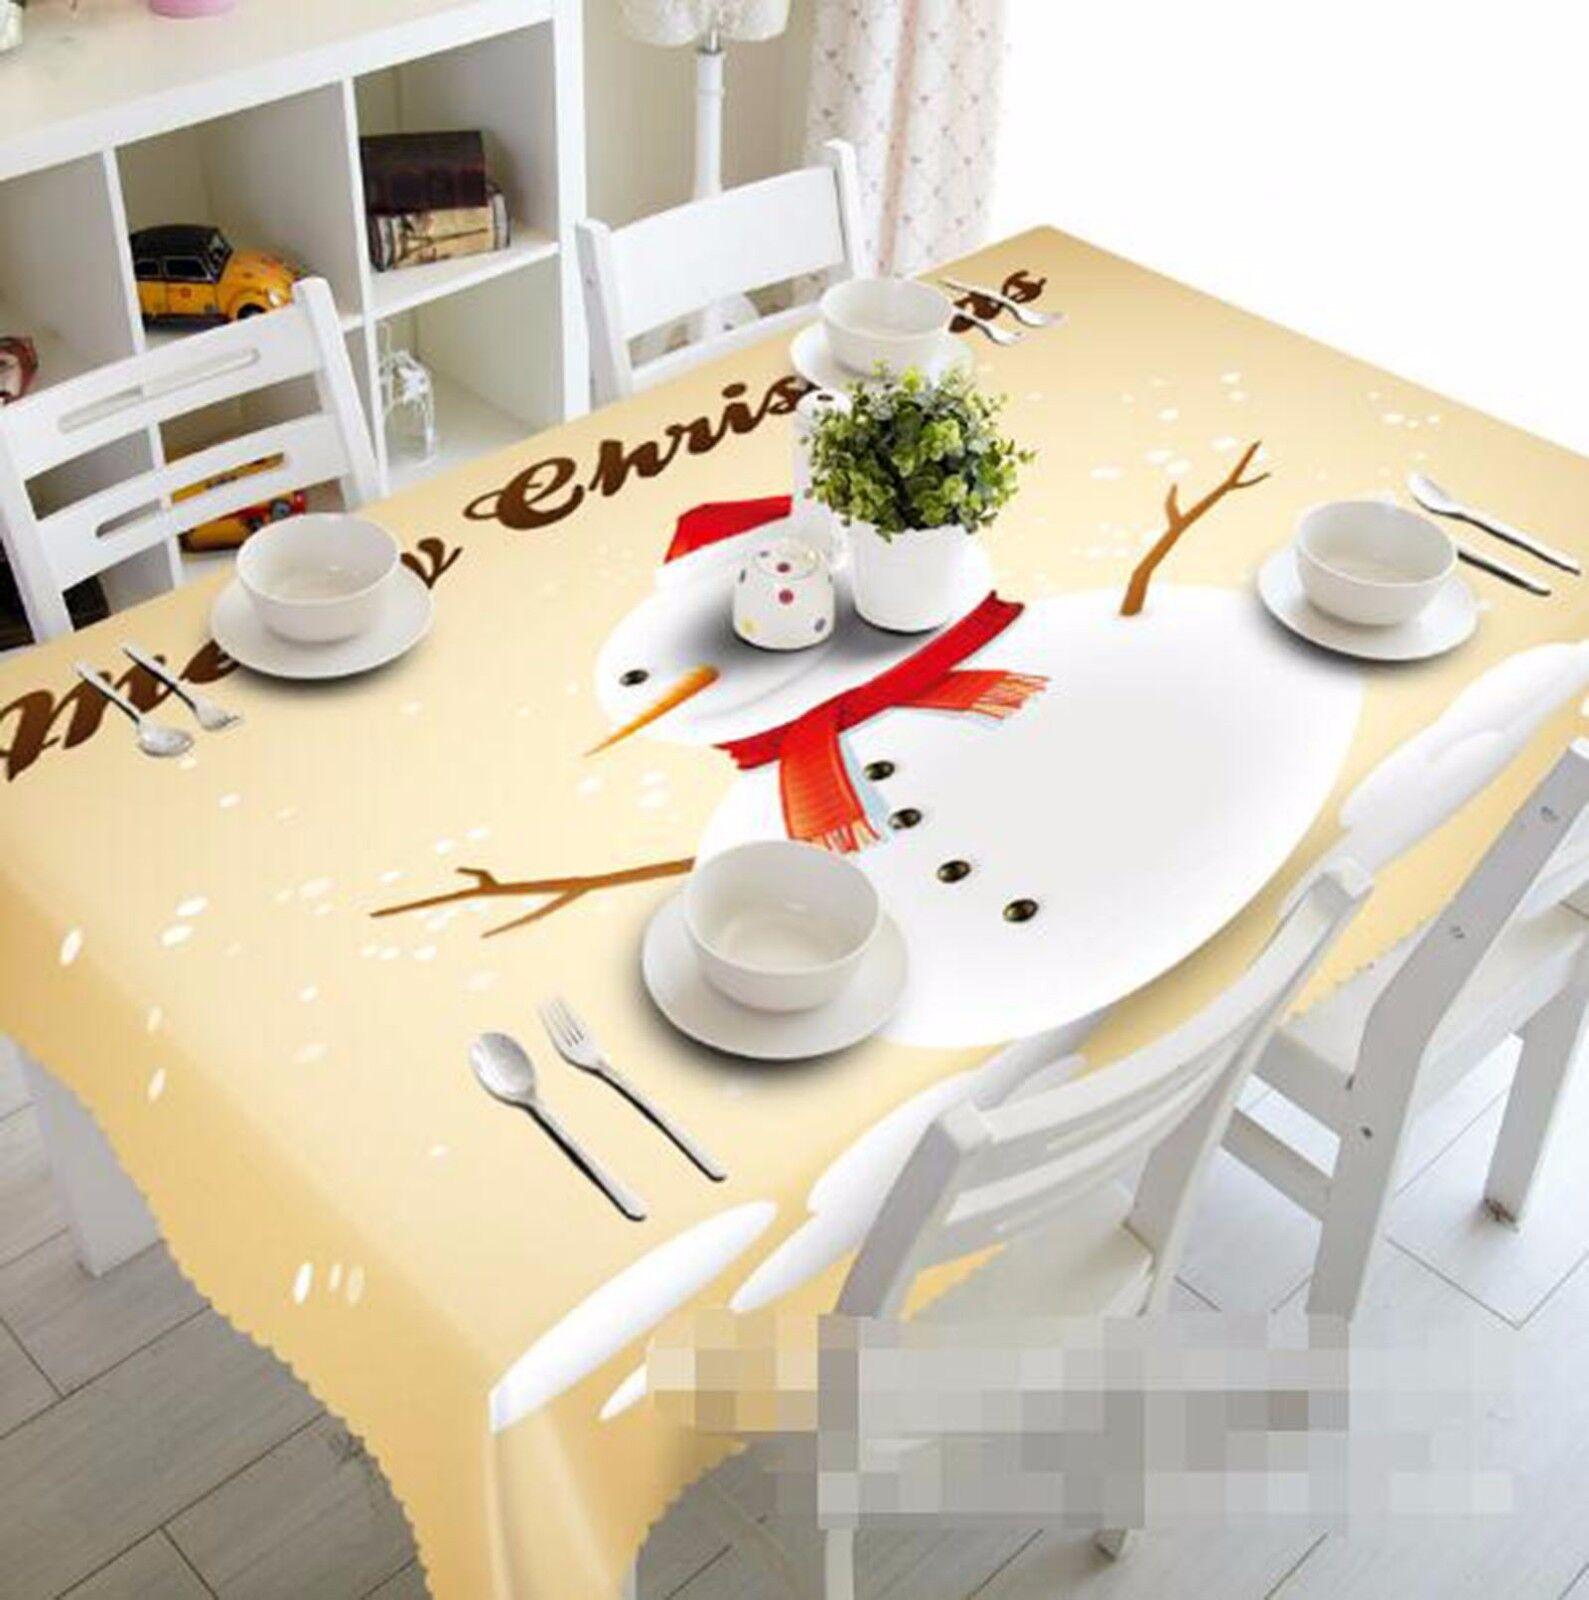 3D Snowman 67 Tablecloth Table Cover Cloth Birthday Party AJ WALLPAPER UK Lemon